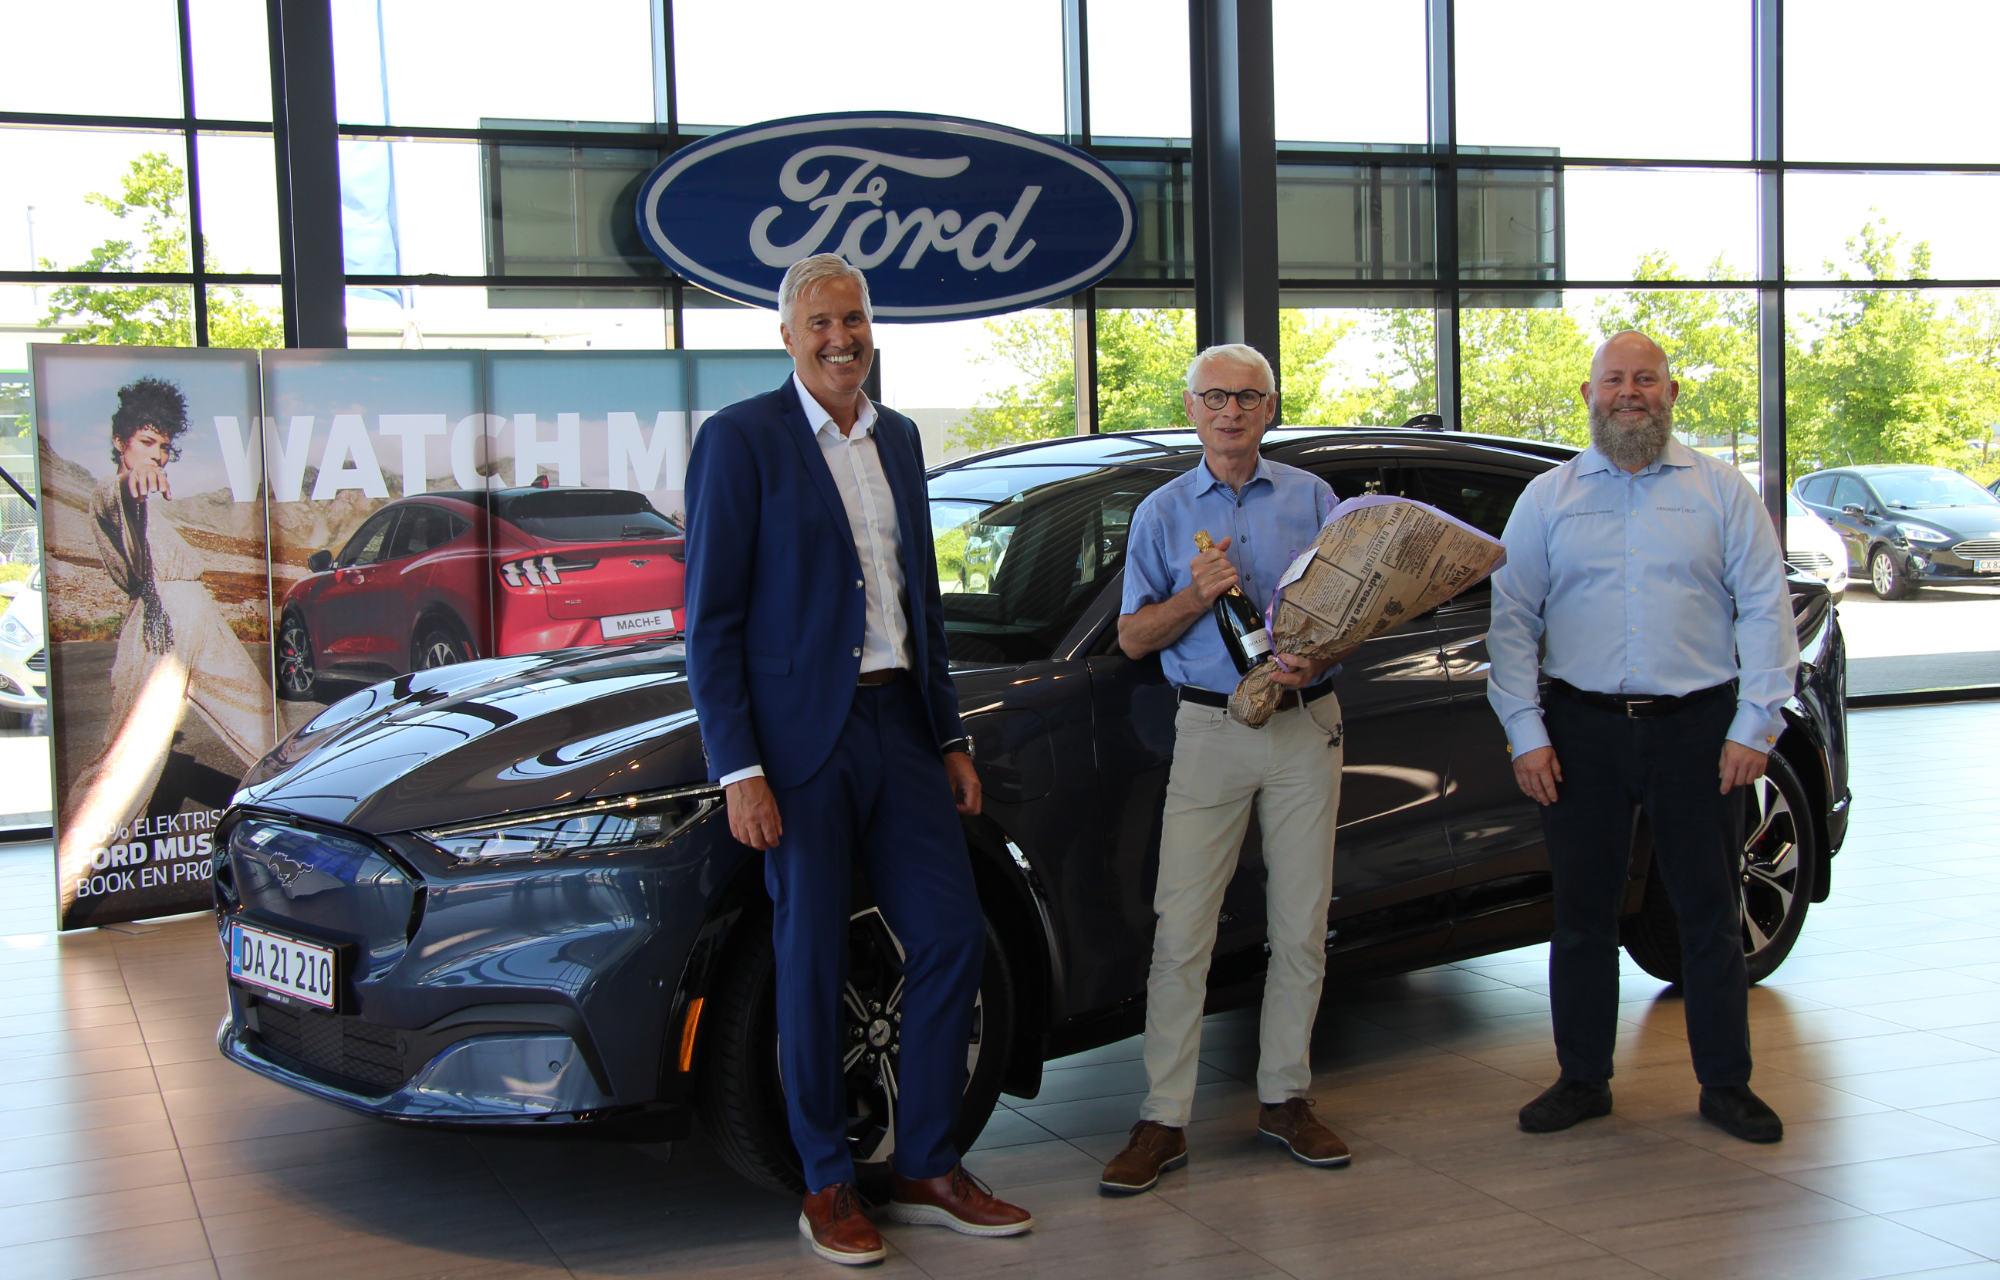 Første danske kunde i Ford Mustang Mach-E